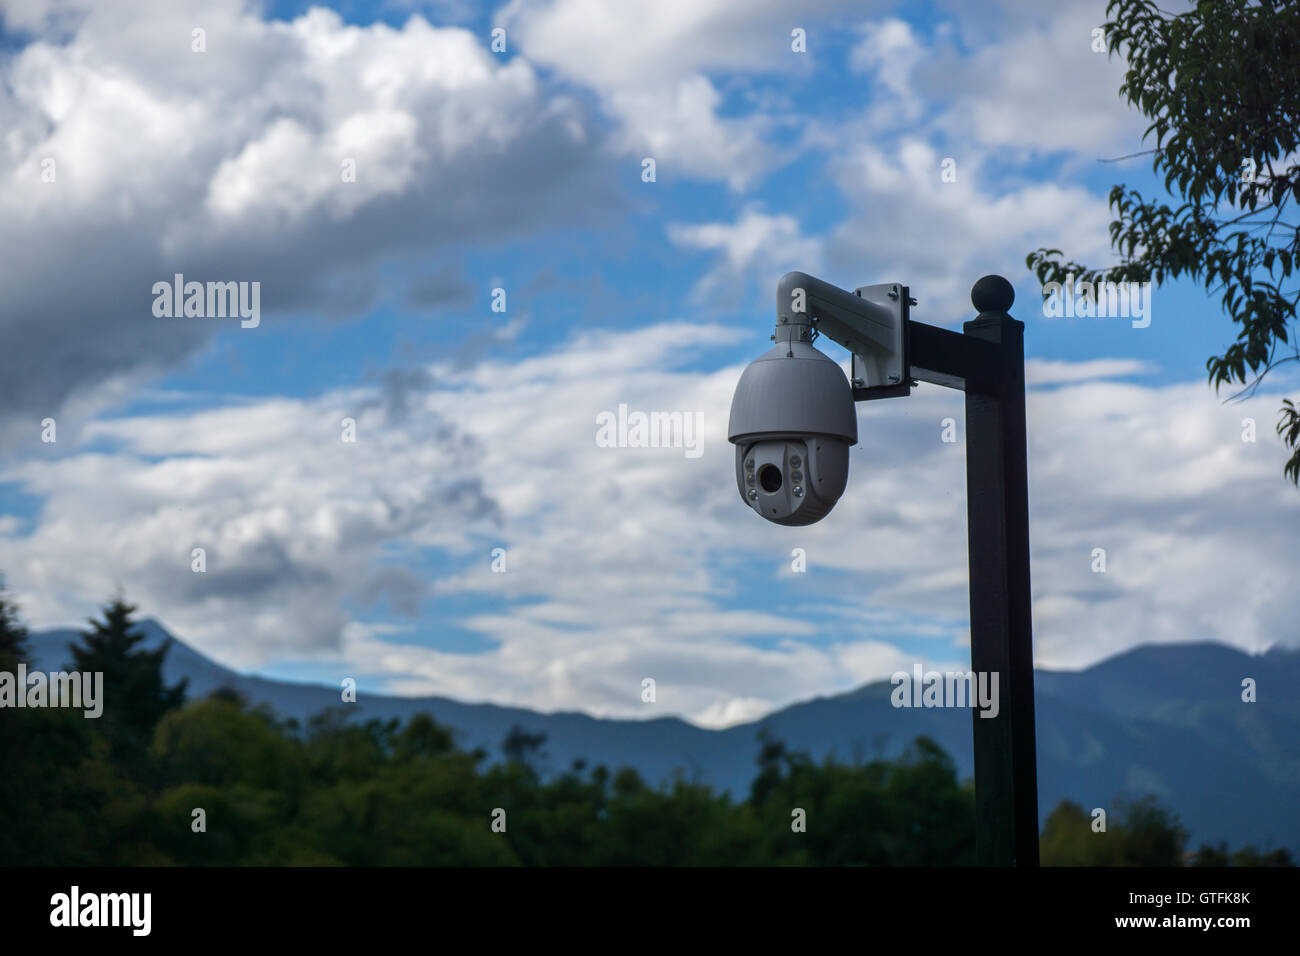 CCTV Camera - Stock Image